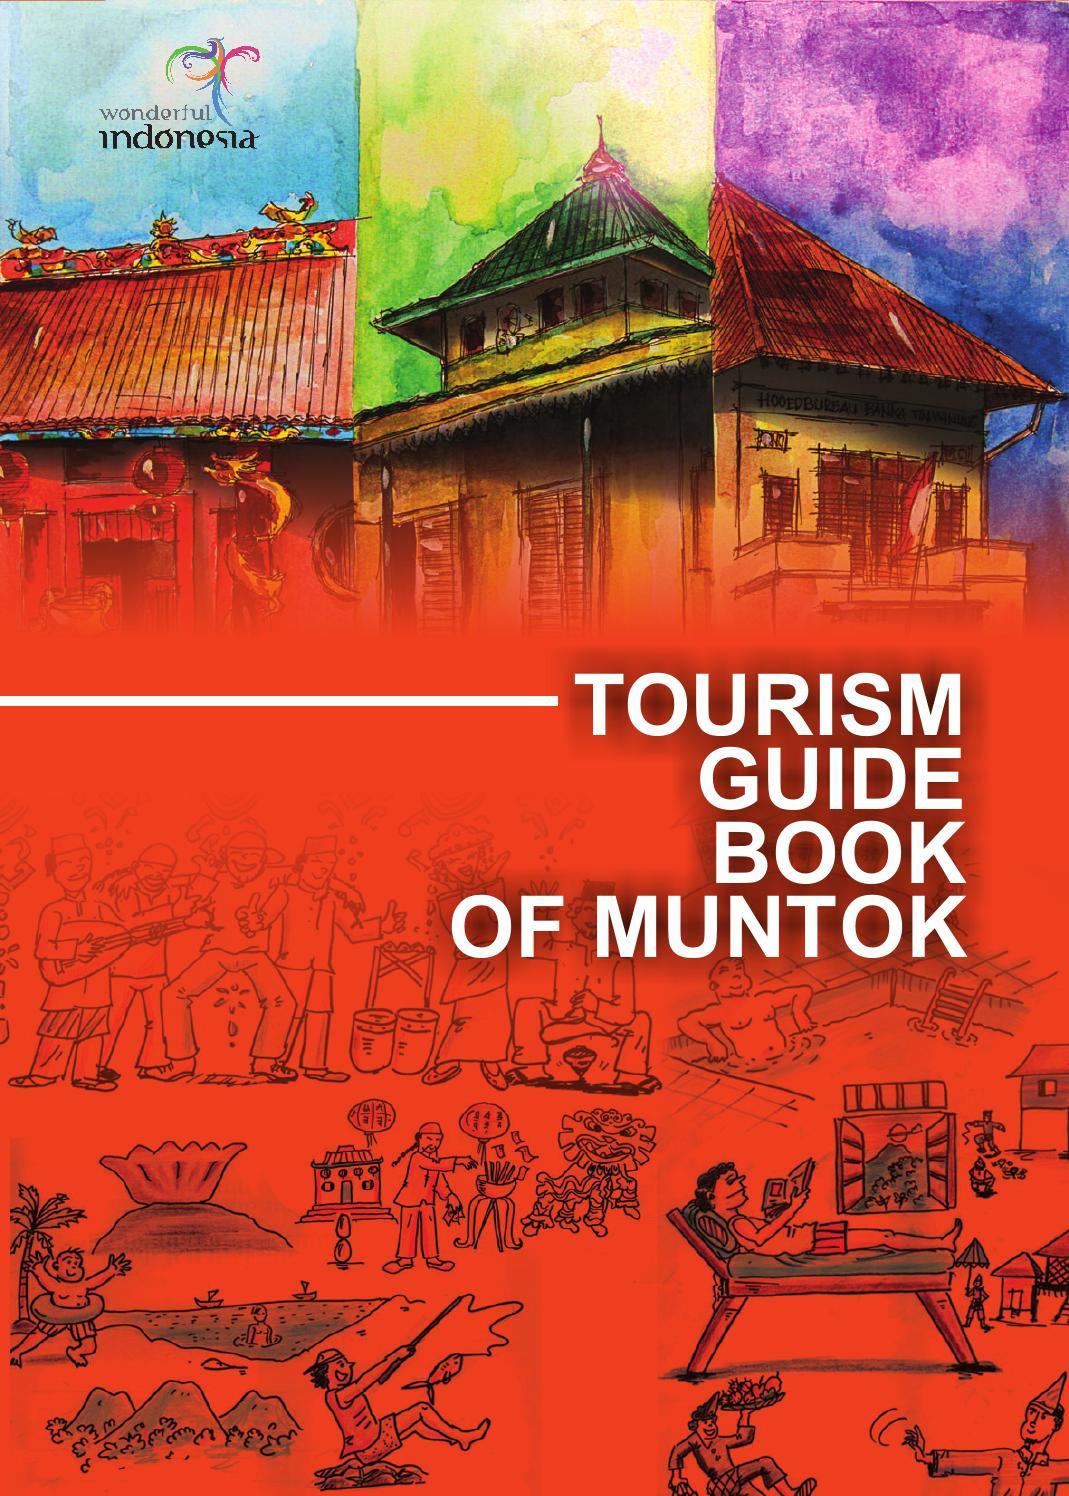 Tourism Buide Book Of Muntok By Ghostcell Issuu Produk Ukm Bumn Jas Koko Motif Etnis